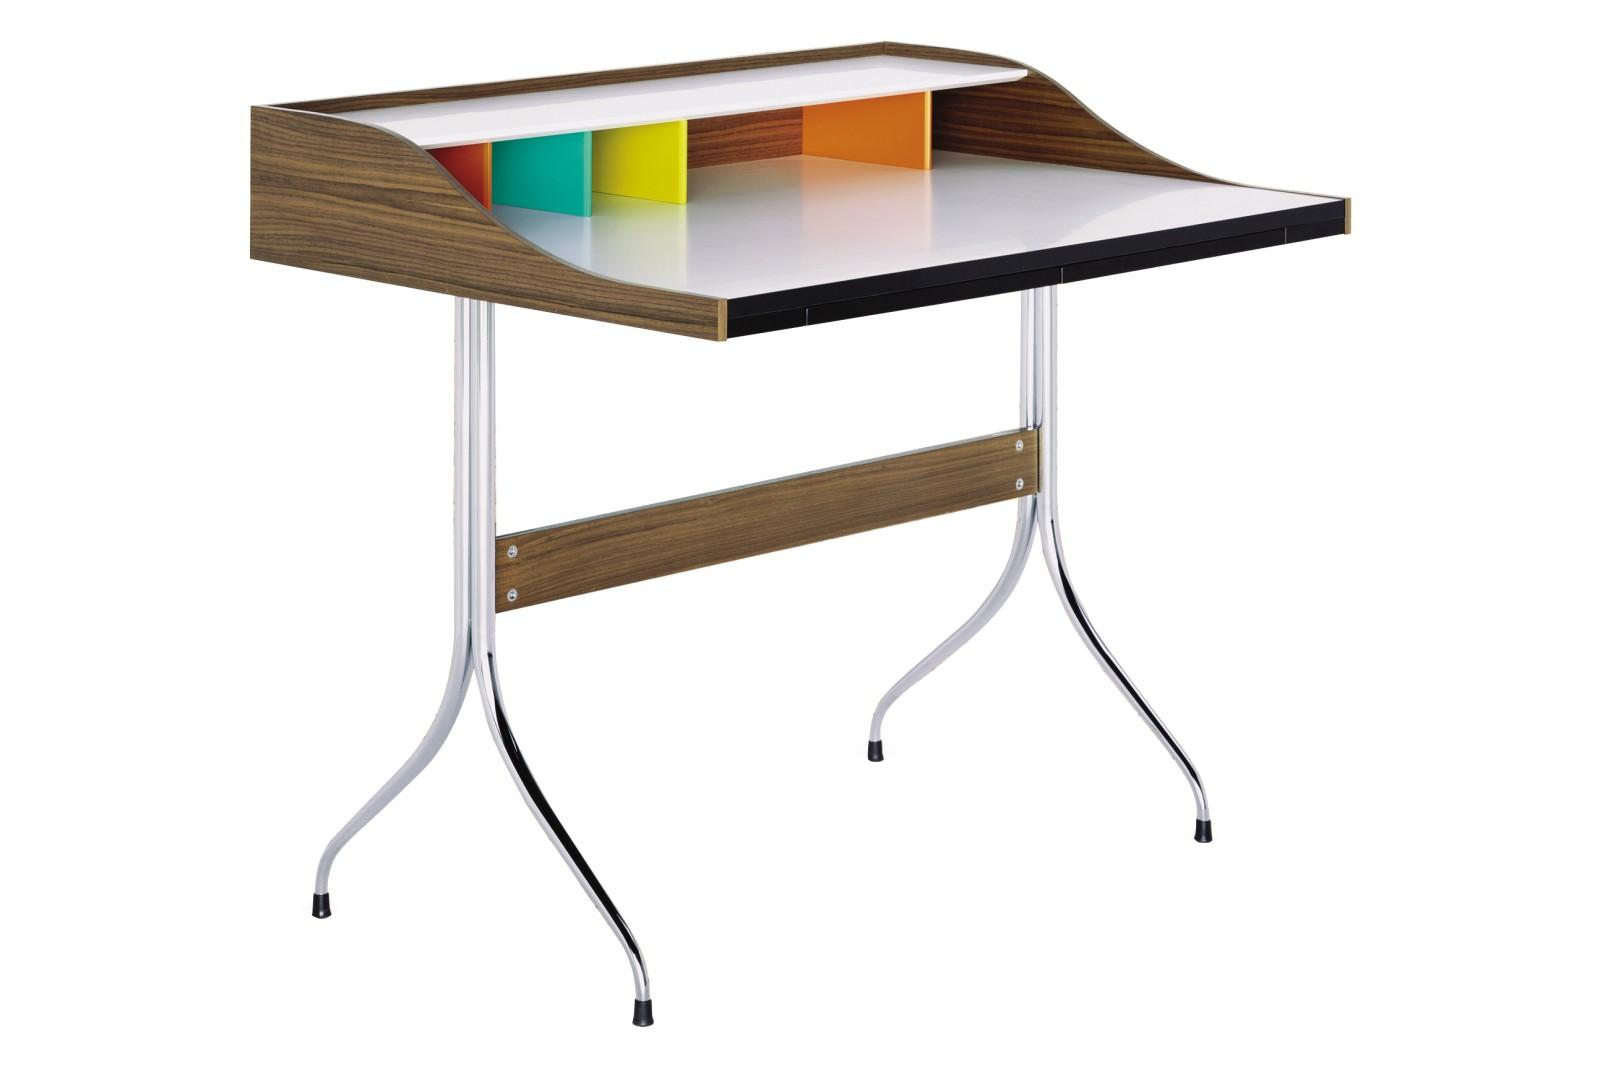 Home Desk walnut veneer, chrome-plated